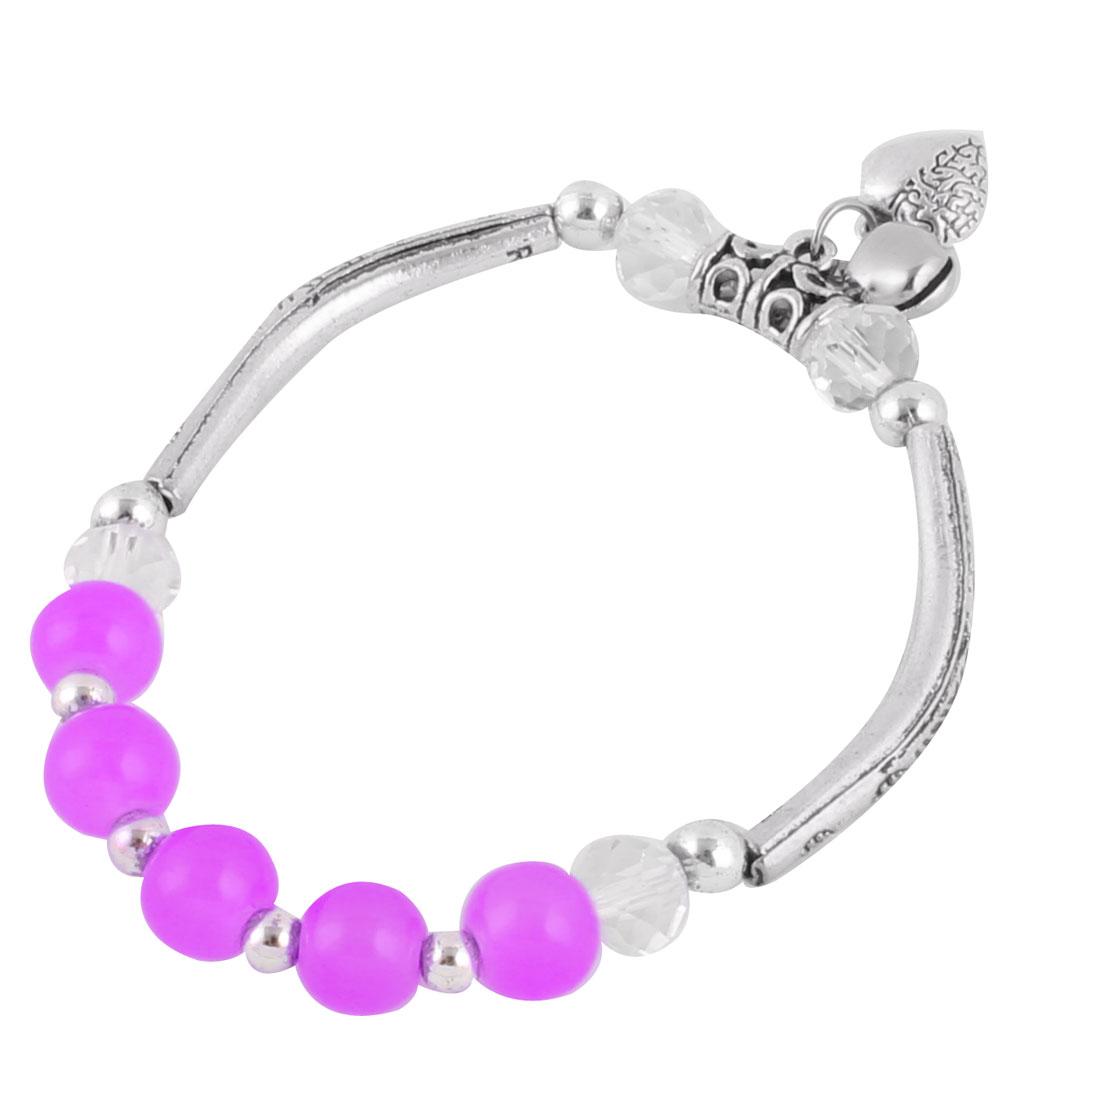 Women Heart Shape Pendant Small Bell Decor Wrist Bracelet Bangle 8mm Dia